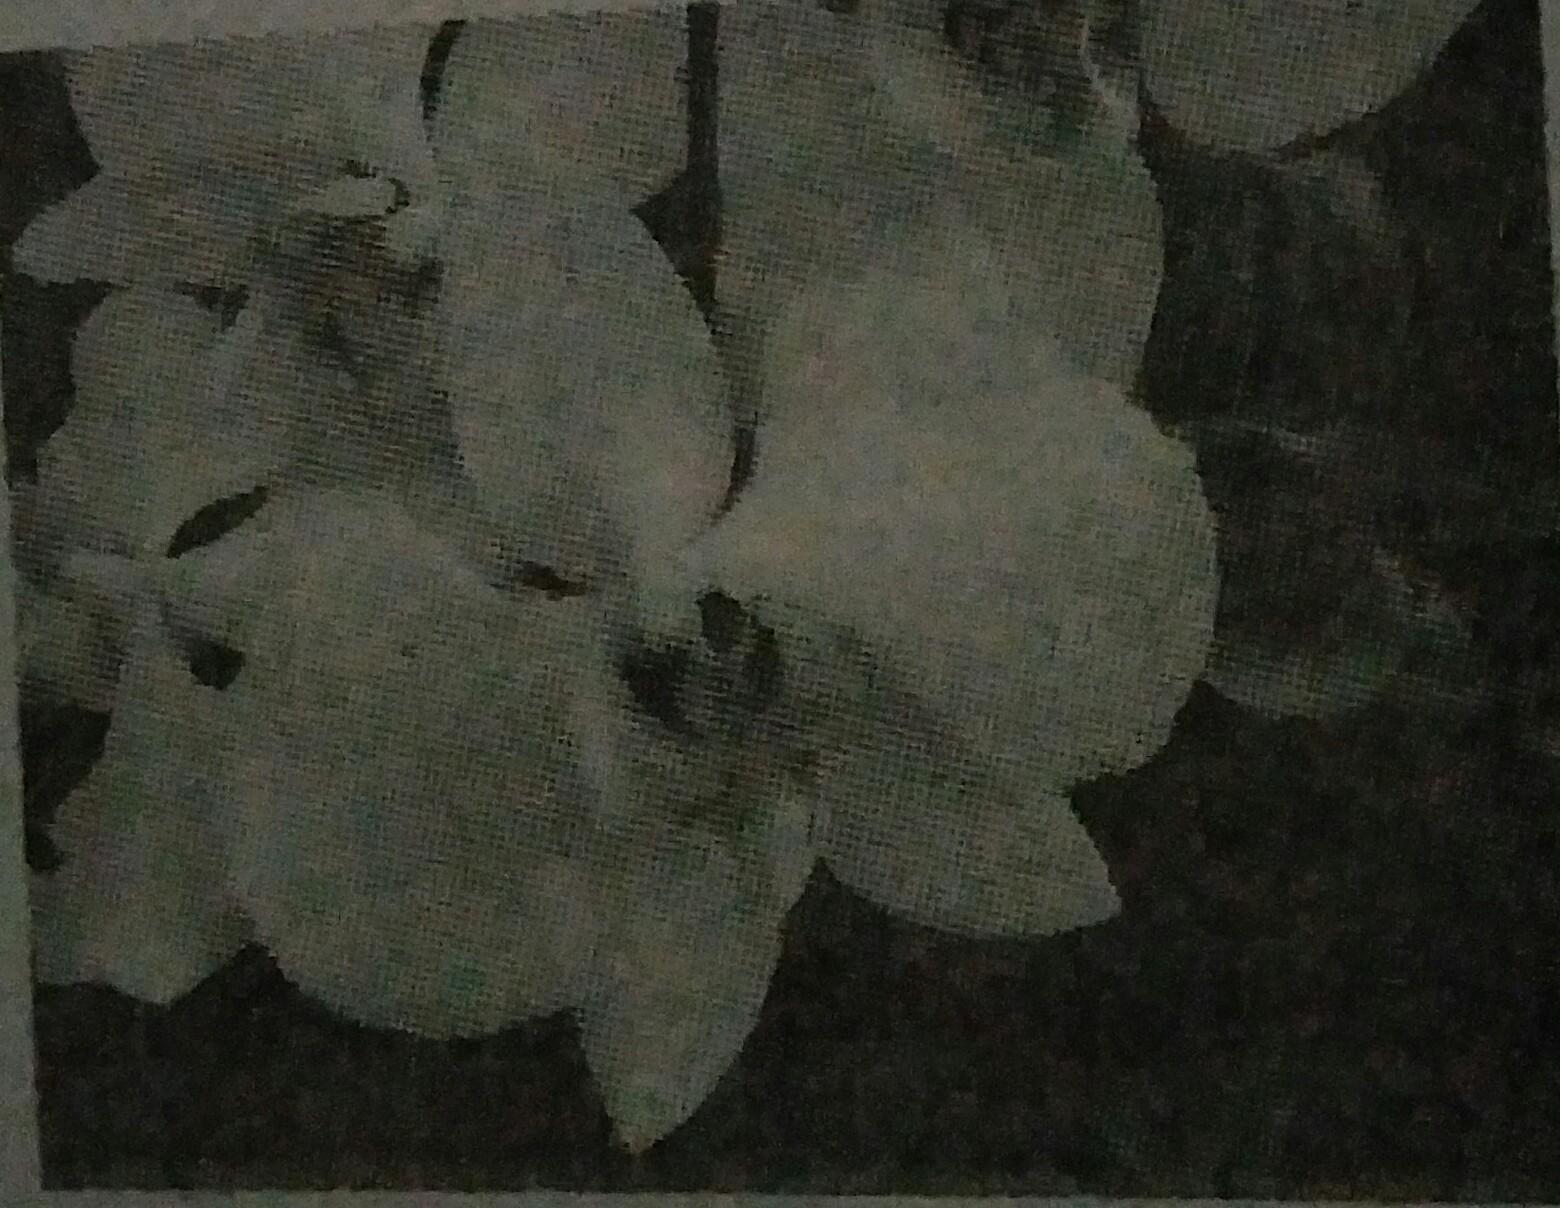 Perhatikan gambar tumbuhan di bawah ini Berdasarkan gambar ...